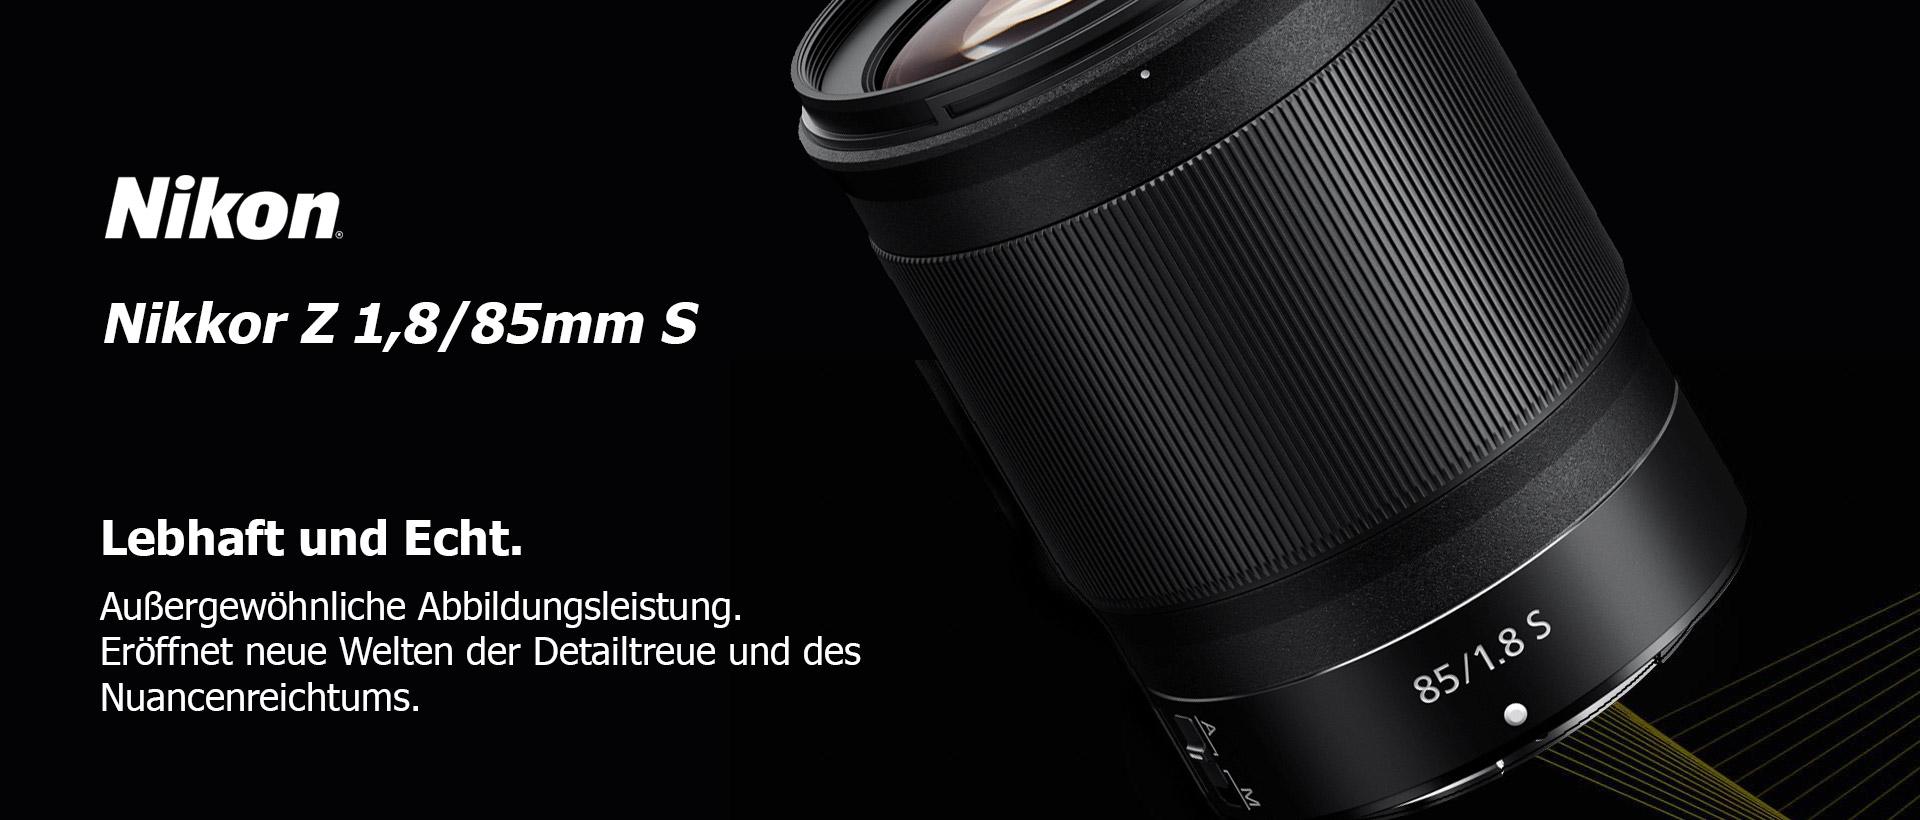 Nikon Z 1,8/85mm S + 5-Jahre-Garantie-Aktion